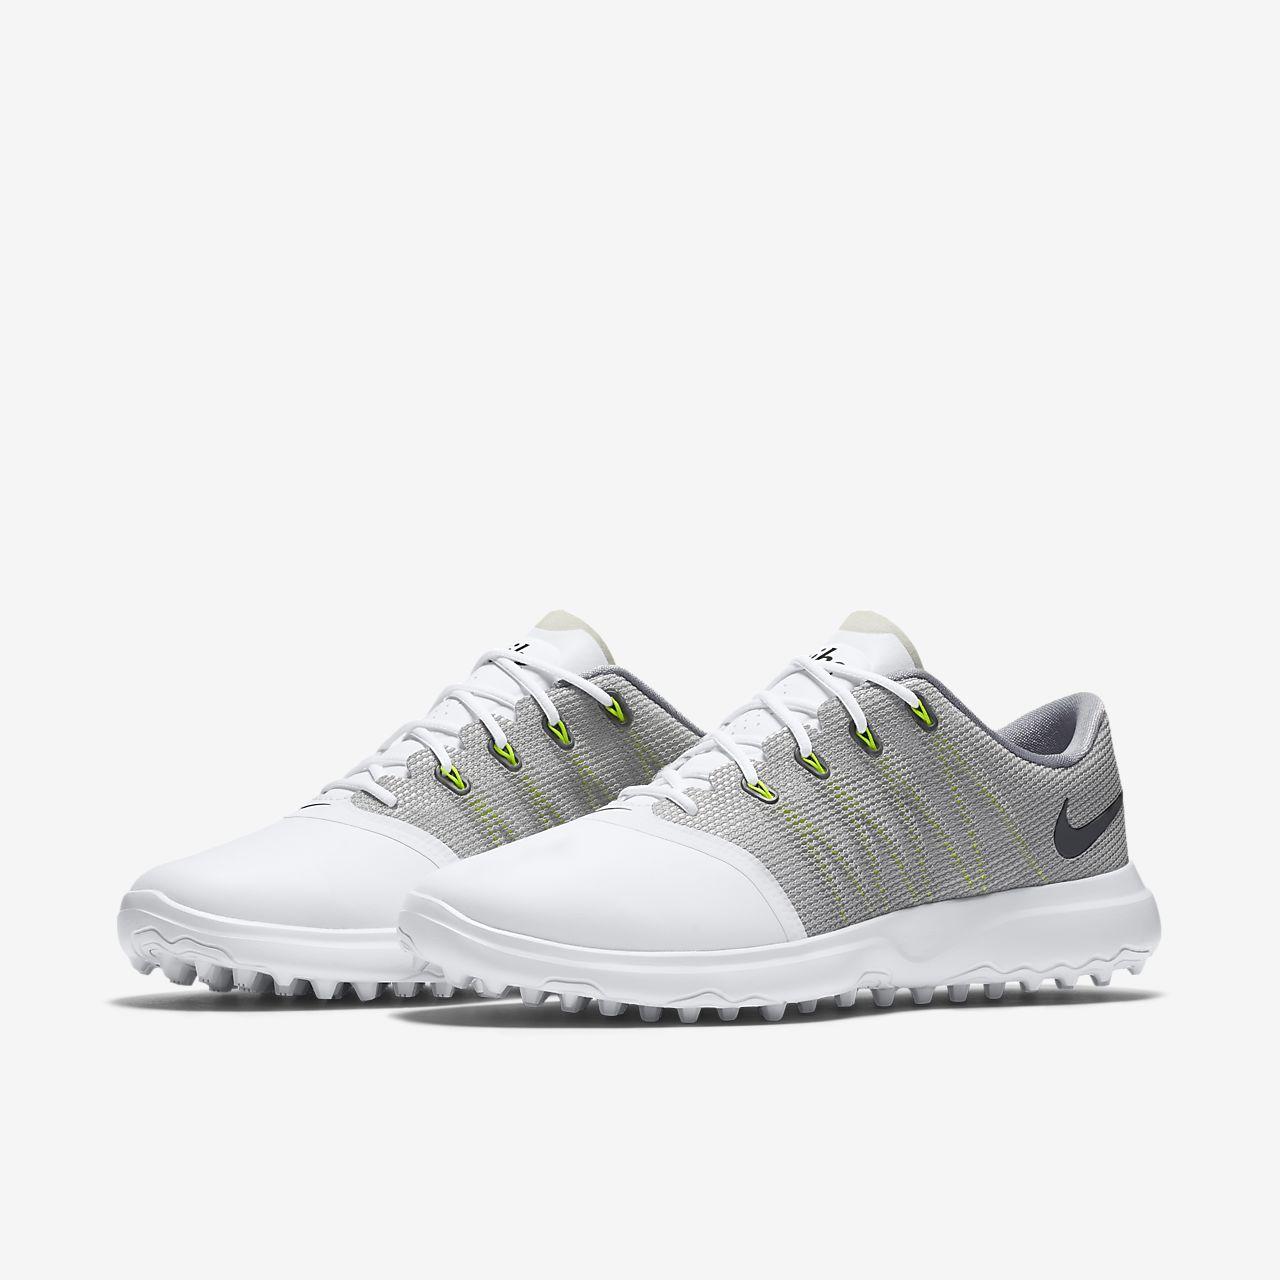 ... Nike Lunar Empress 2 Women's Golf Shoe